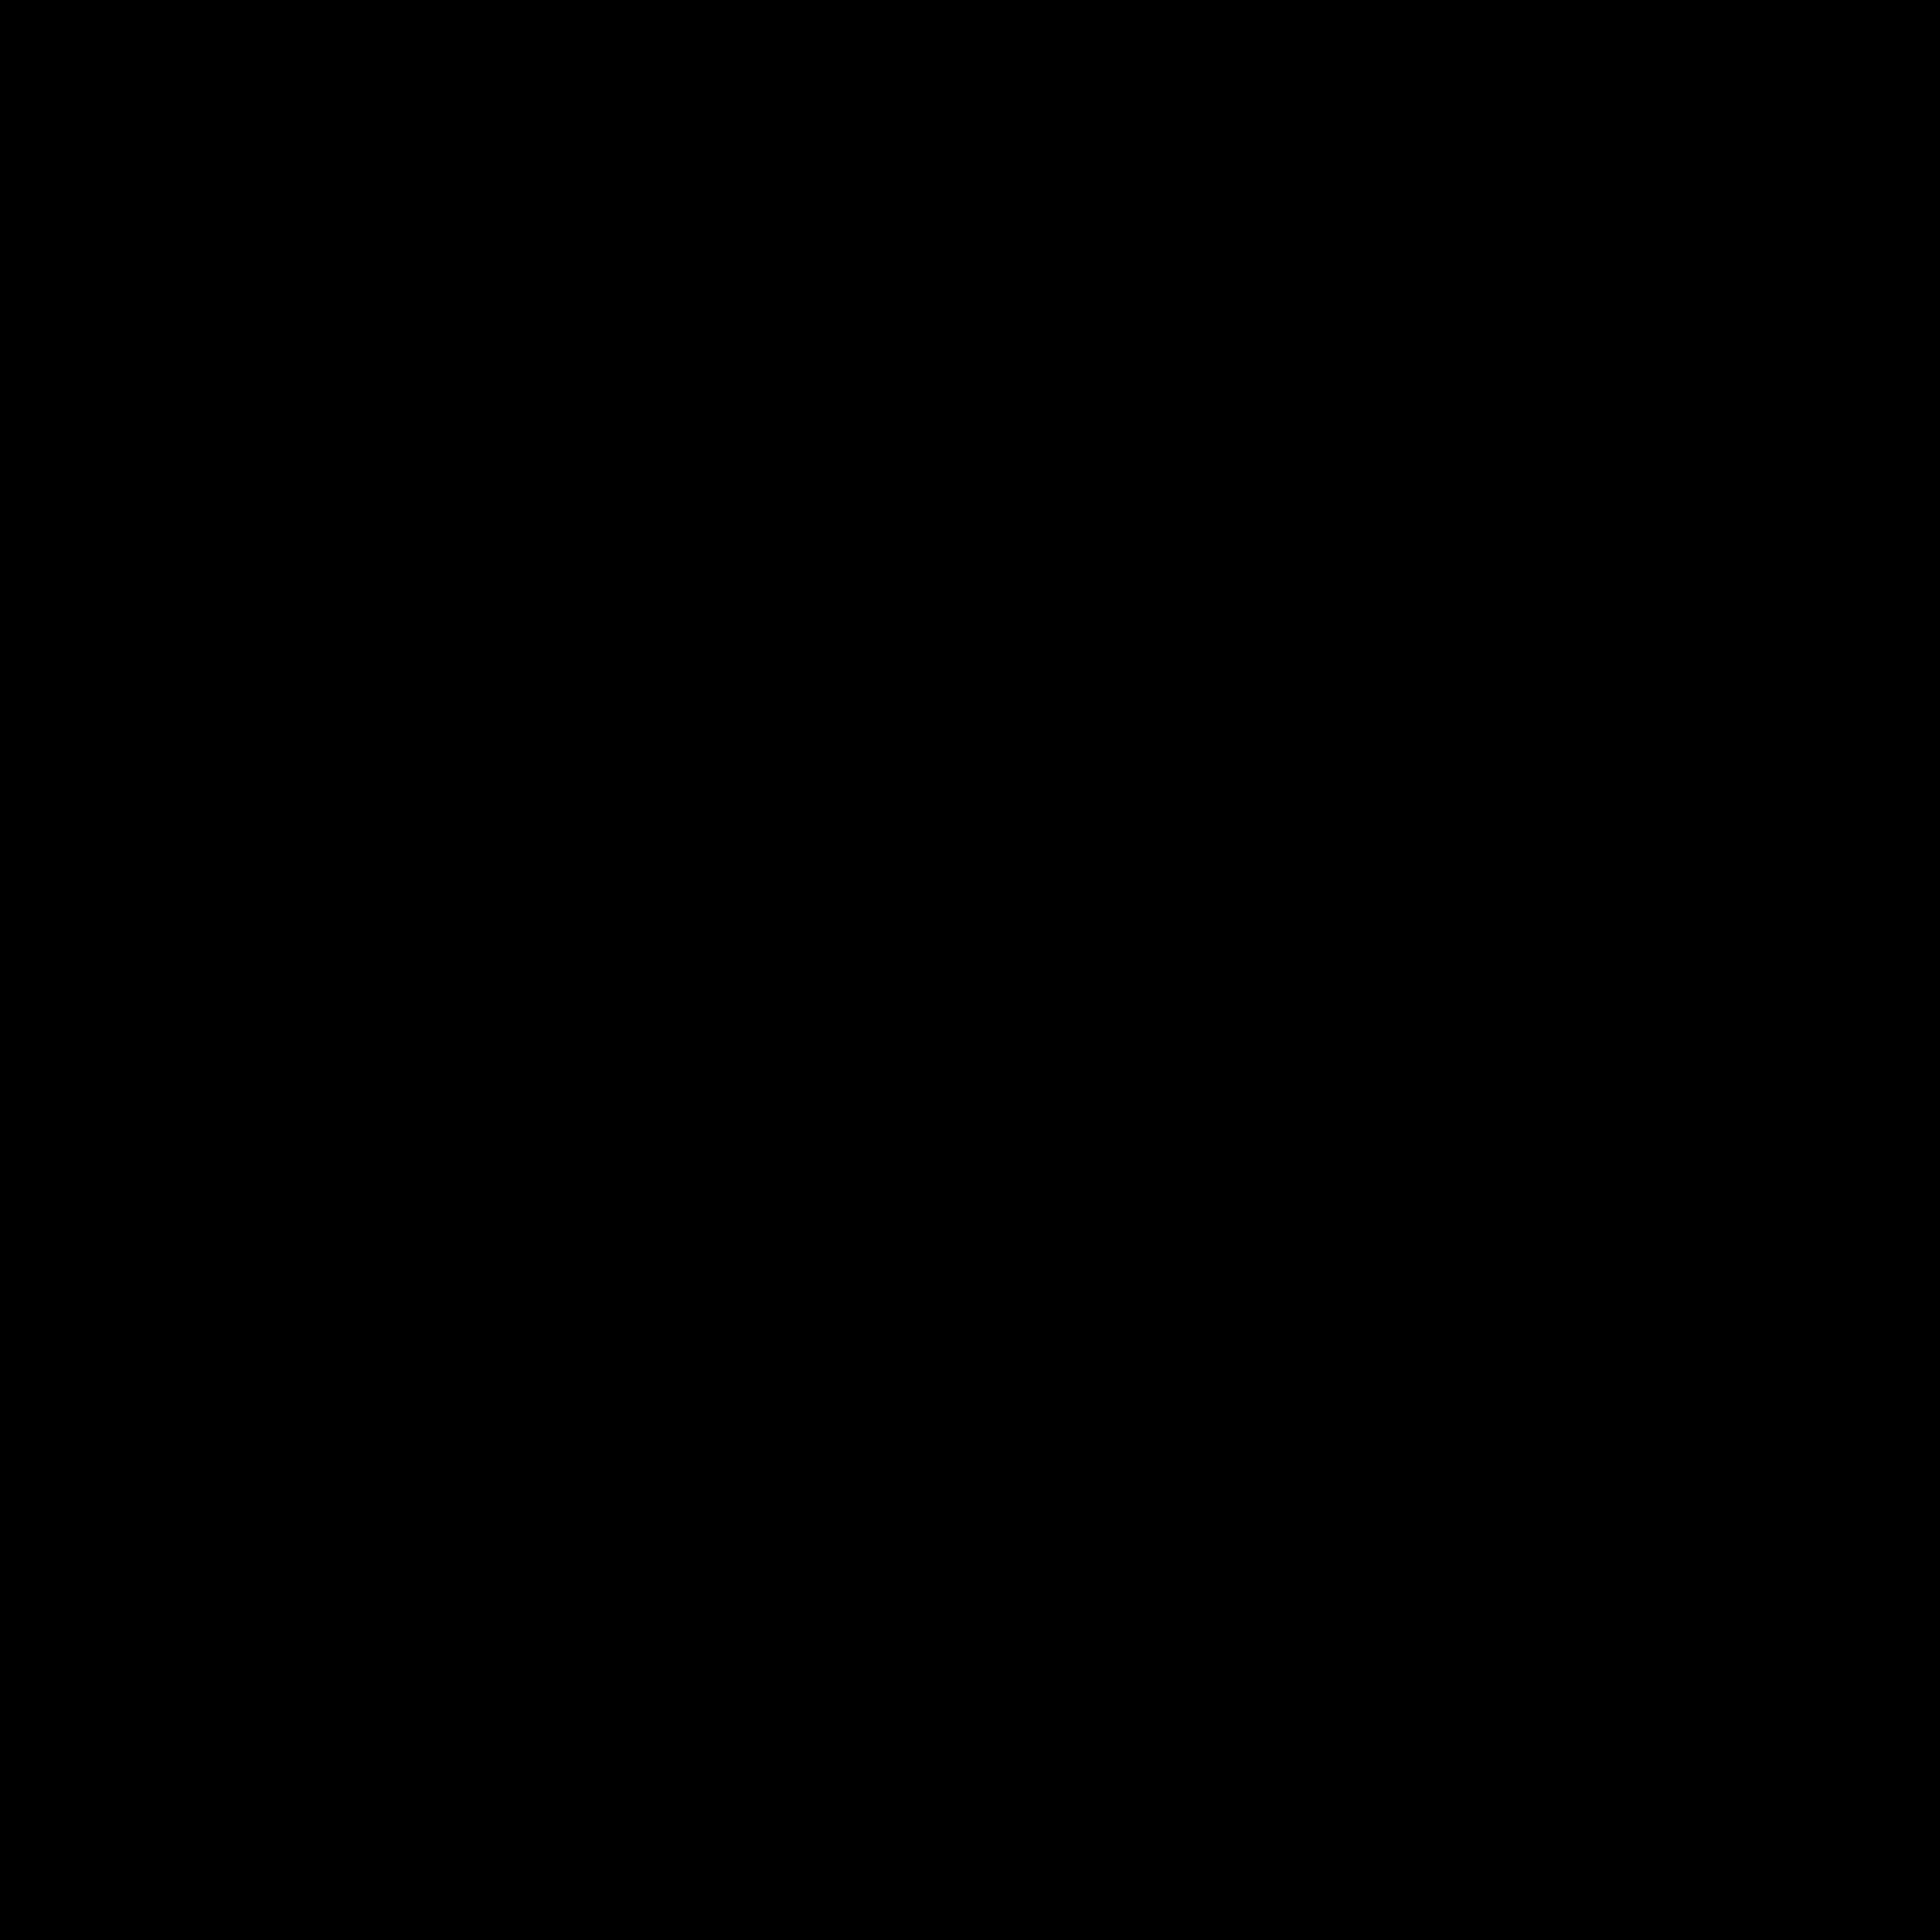 Open In Media ViewerConfiguration. ੴ, -Open in Media ViewerConfiguration. ੴ, Ek Onkar ClipartLook.com -12